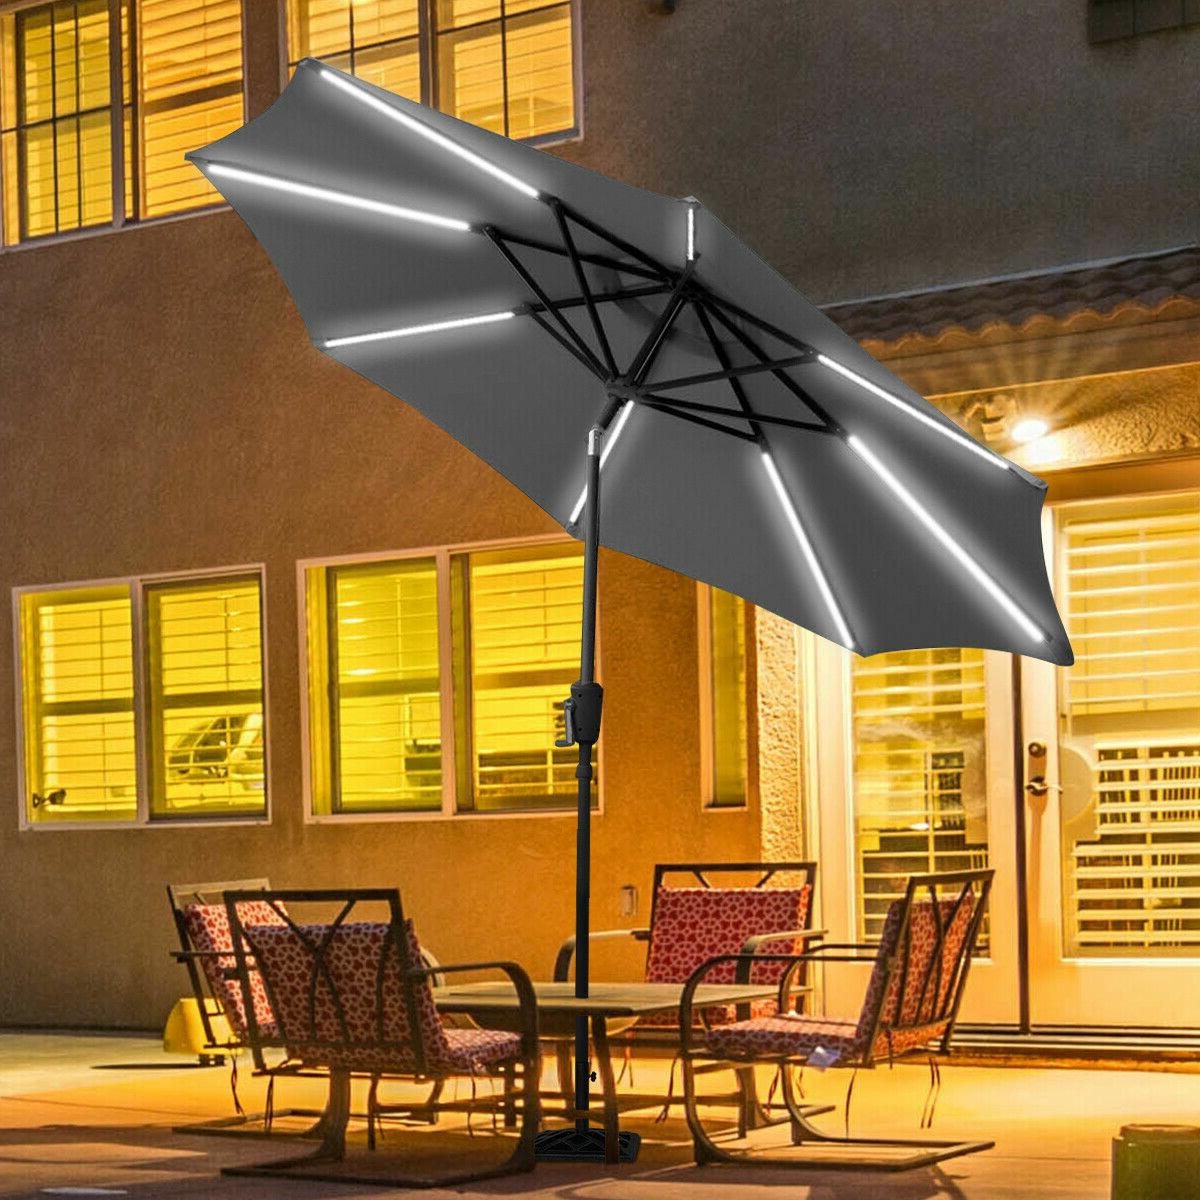 Sinclair 9' Patio Led Light Market Umbrella Regarding Most Popular Fairford Market Umbrellas (View 18 of 20)